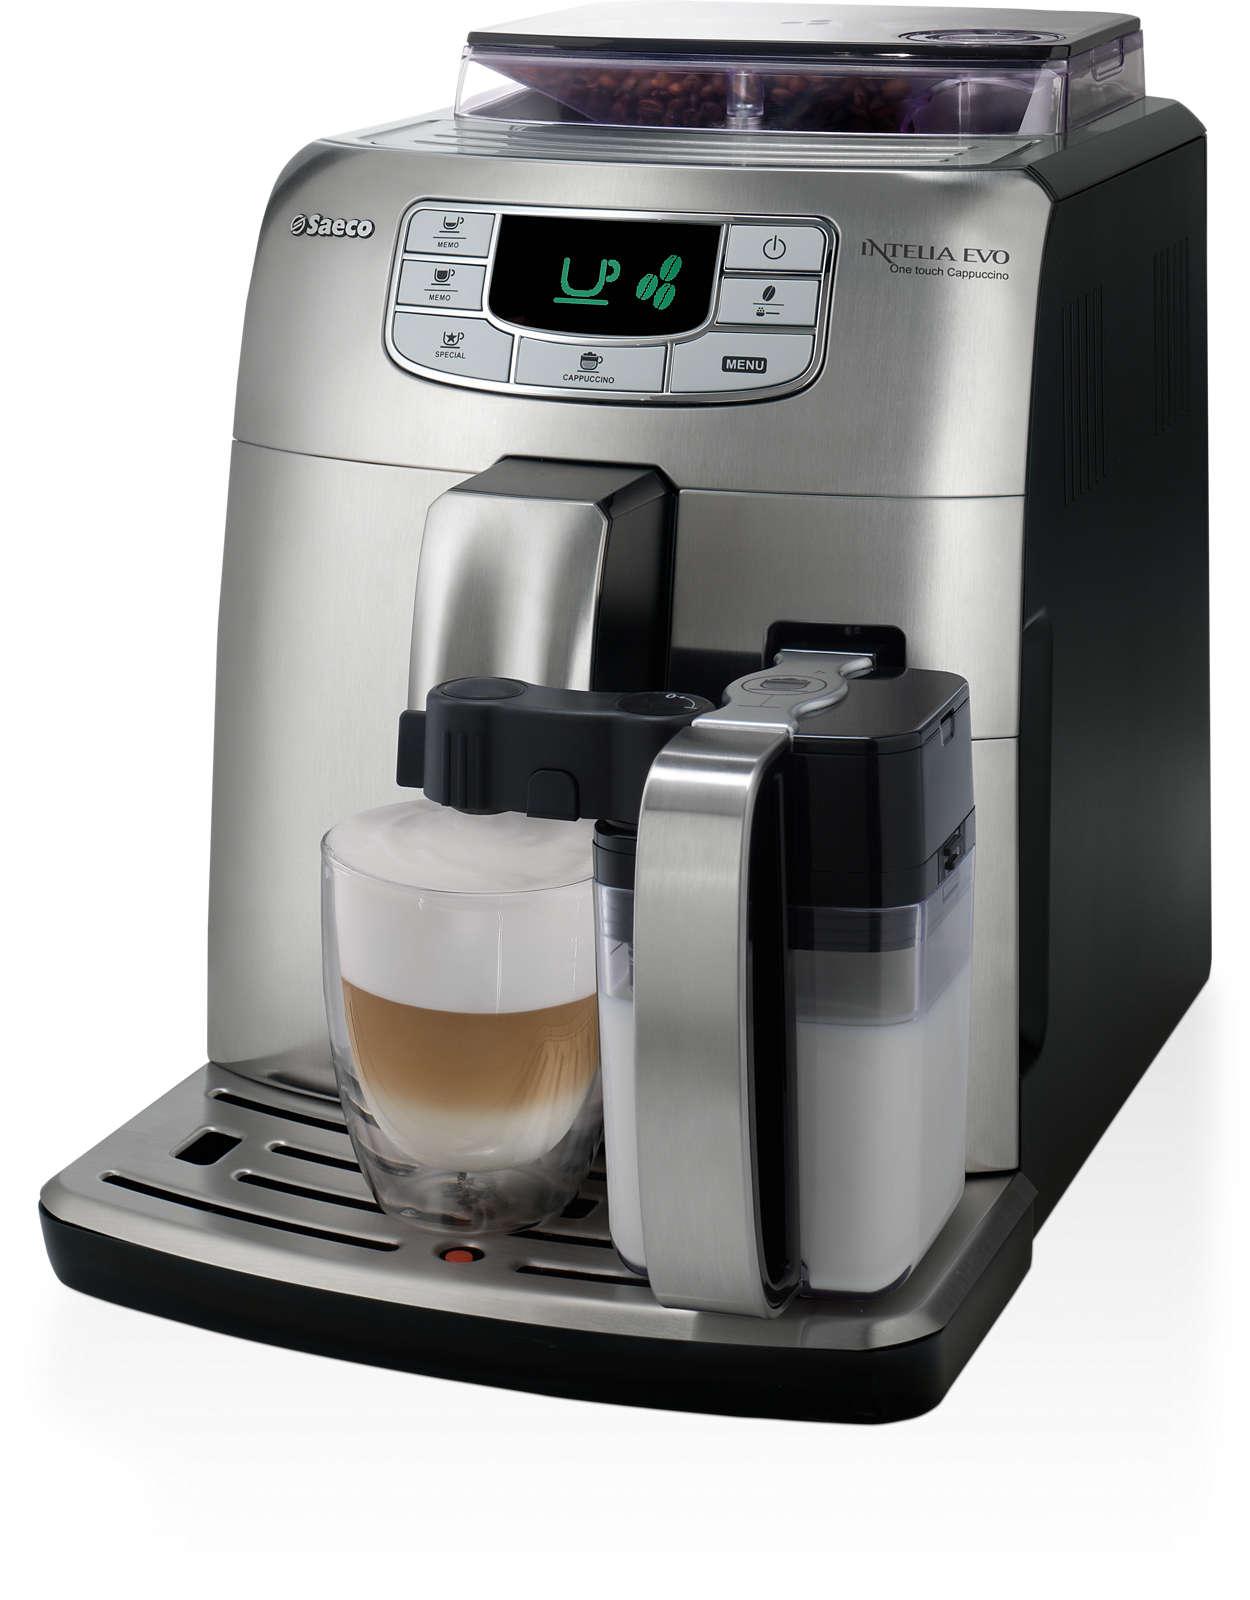 Espresso a cappuccino jedným dotykom